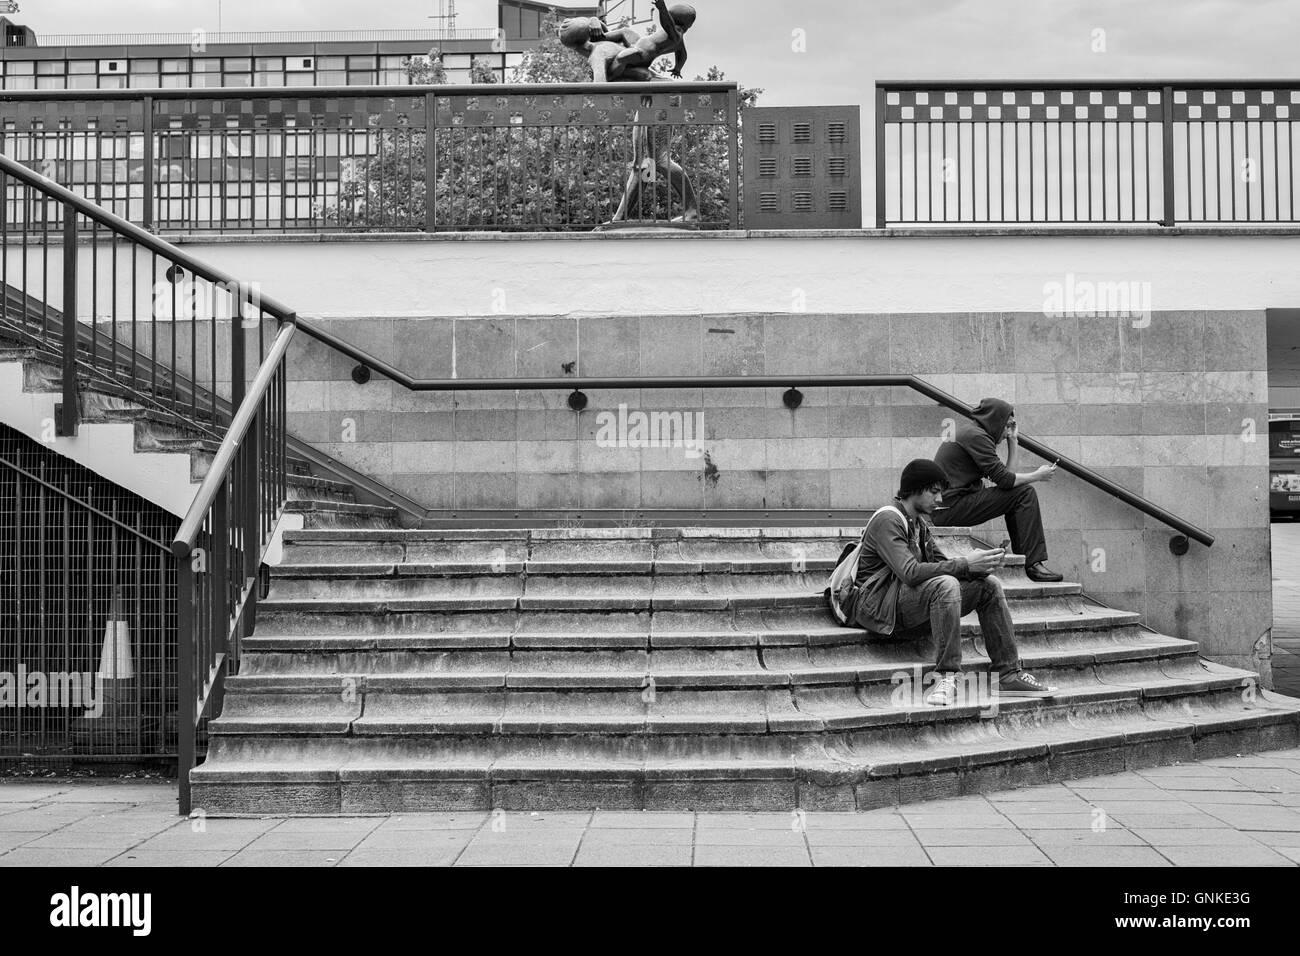 Street Photography - Stock Image